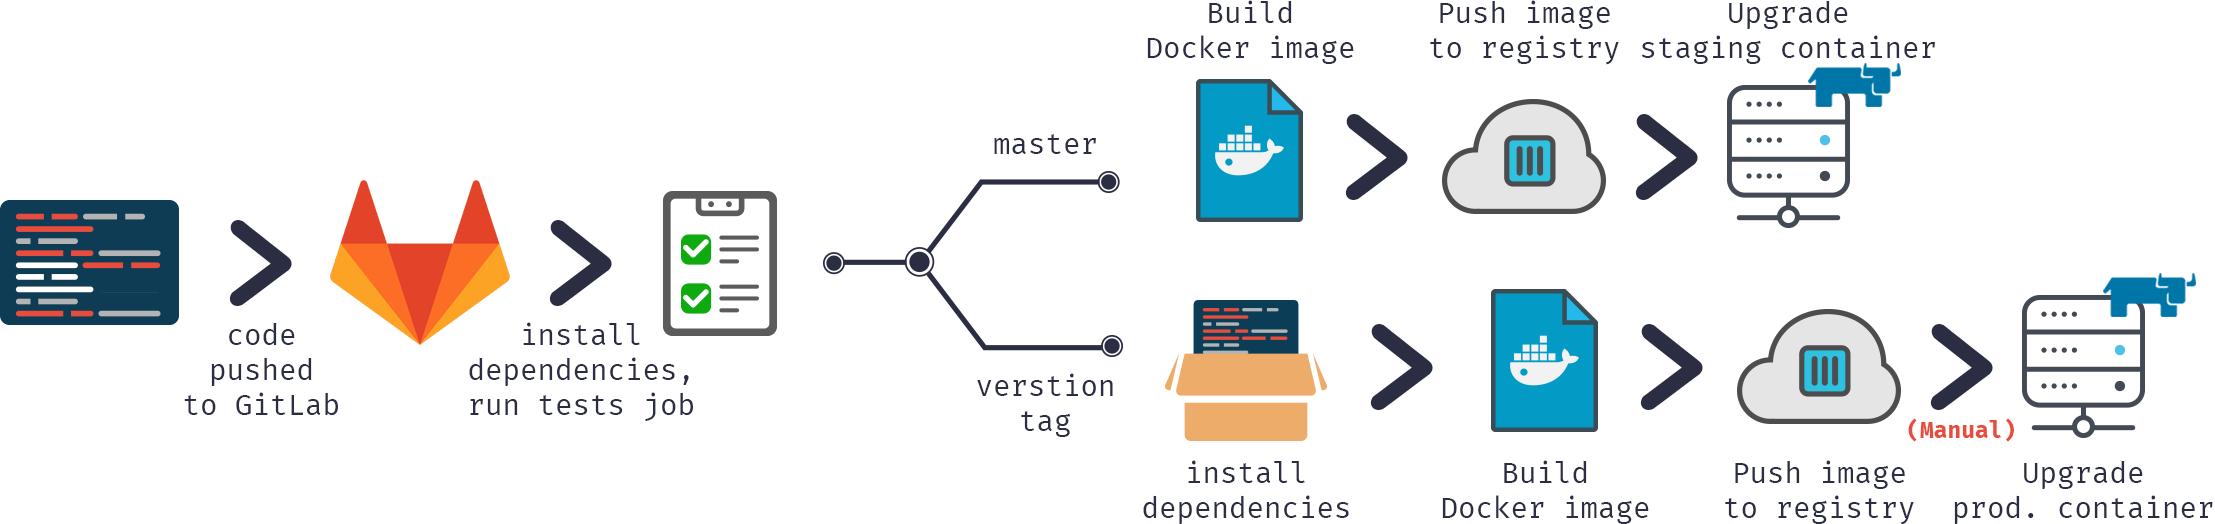 GitLab для Continuous Delivery проекта на технологиях InterSystems: Контейнеры - 4